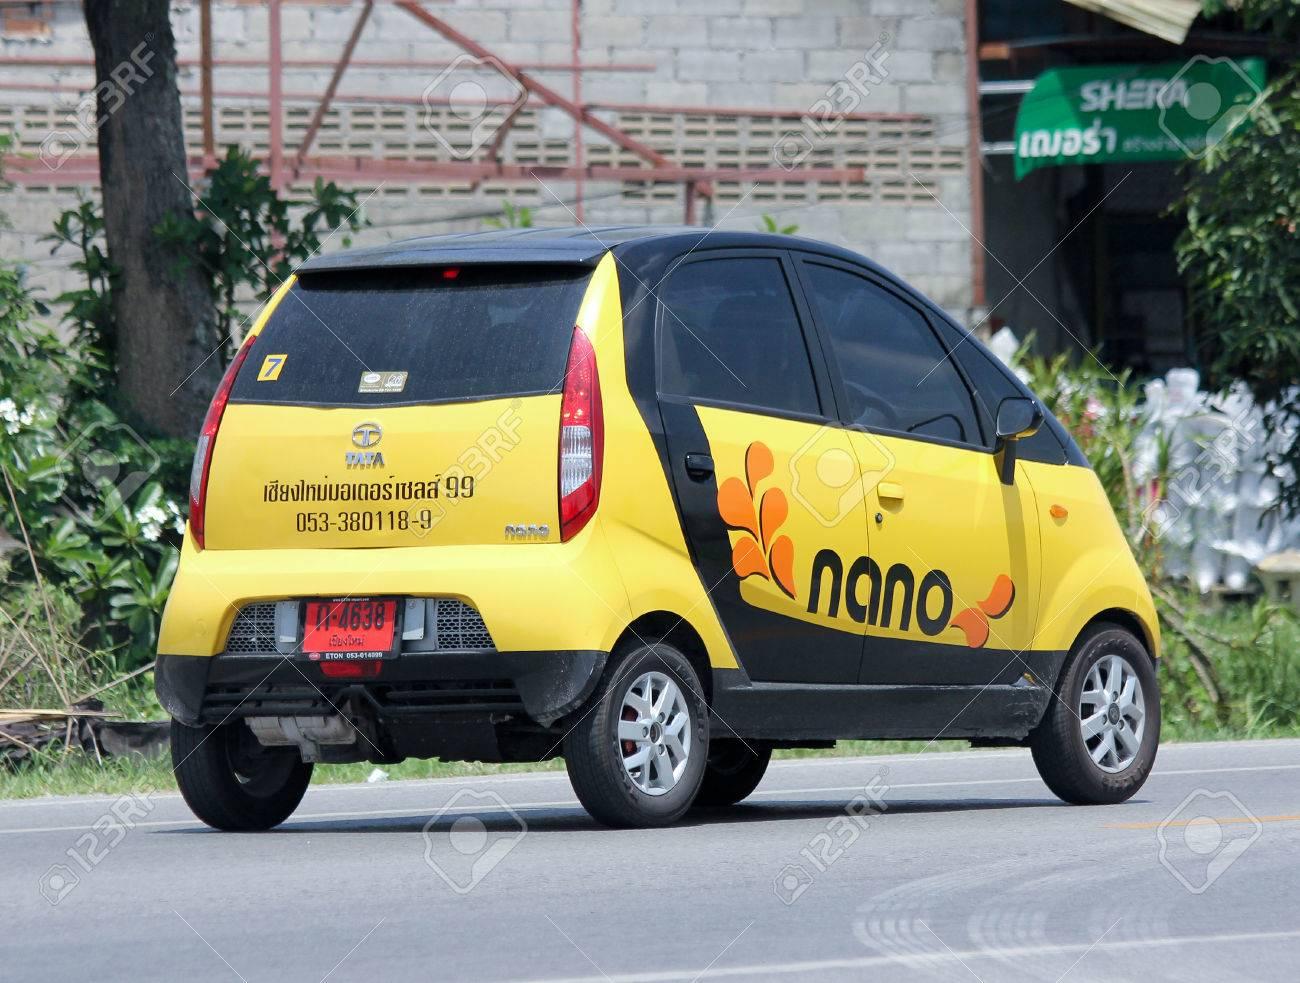 Design of tata nano car - Chiangmai Thailand June 4 2015 Private Tata Nano Car Photo At Road No